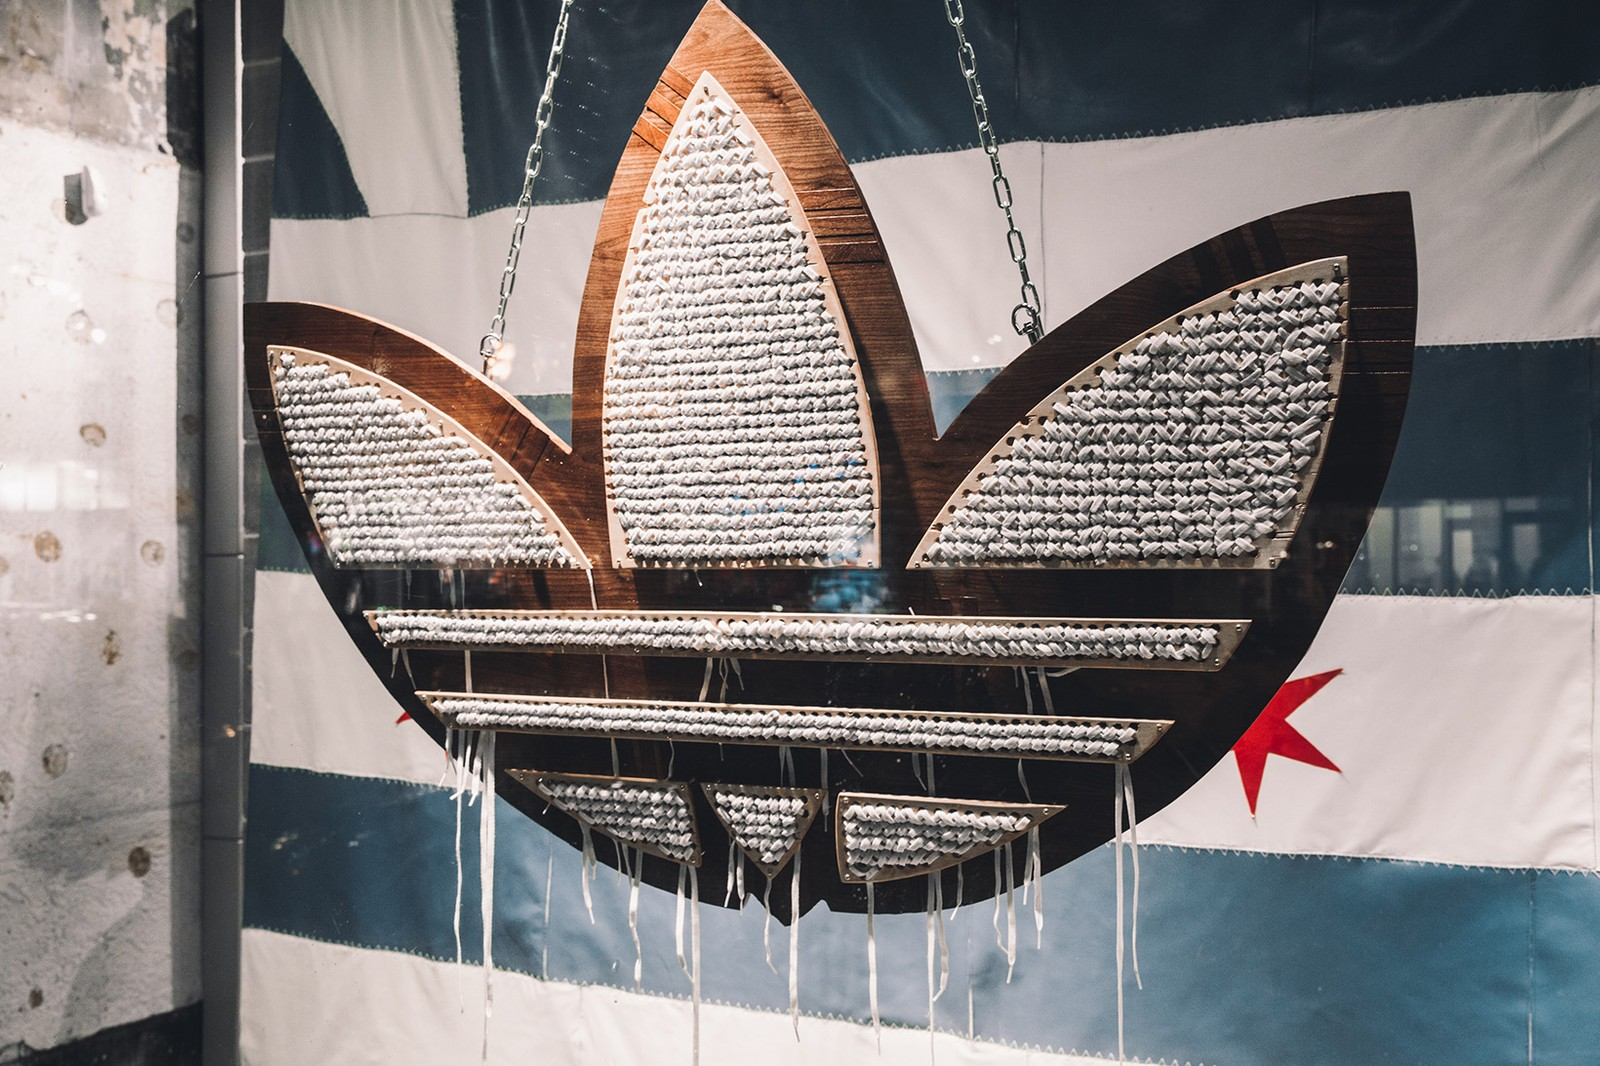 stitch gawd cross craft artist emma mckee customization hip hop chicago interview chance the rapper vic mensa